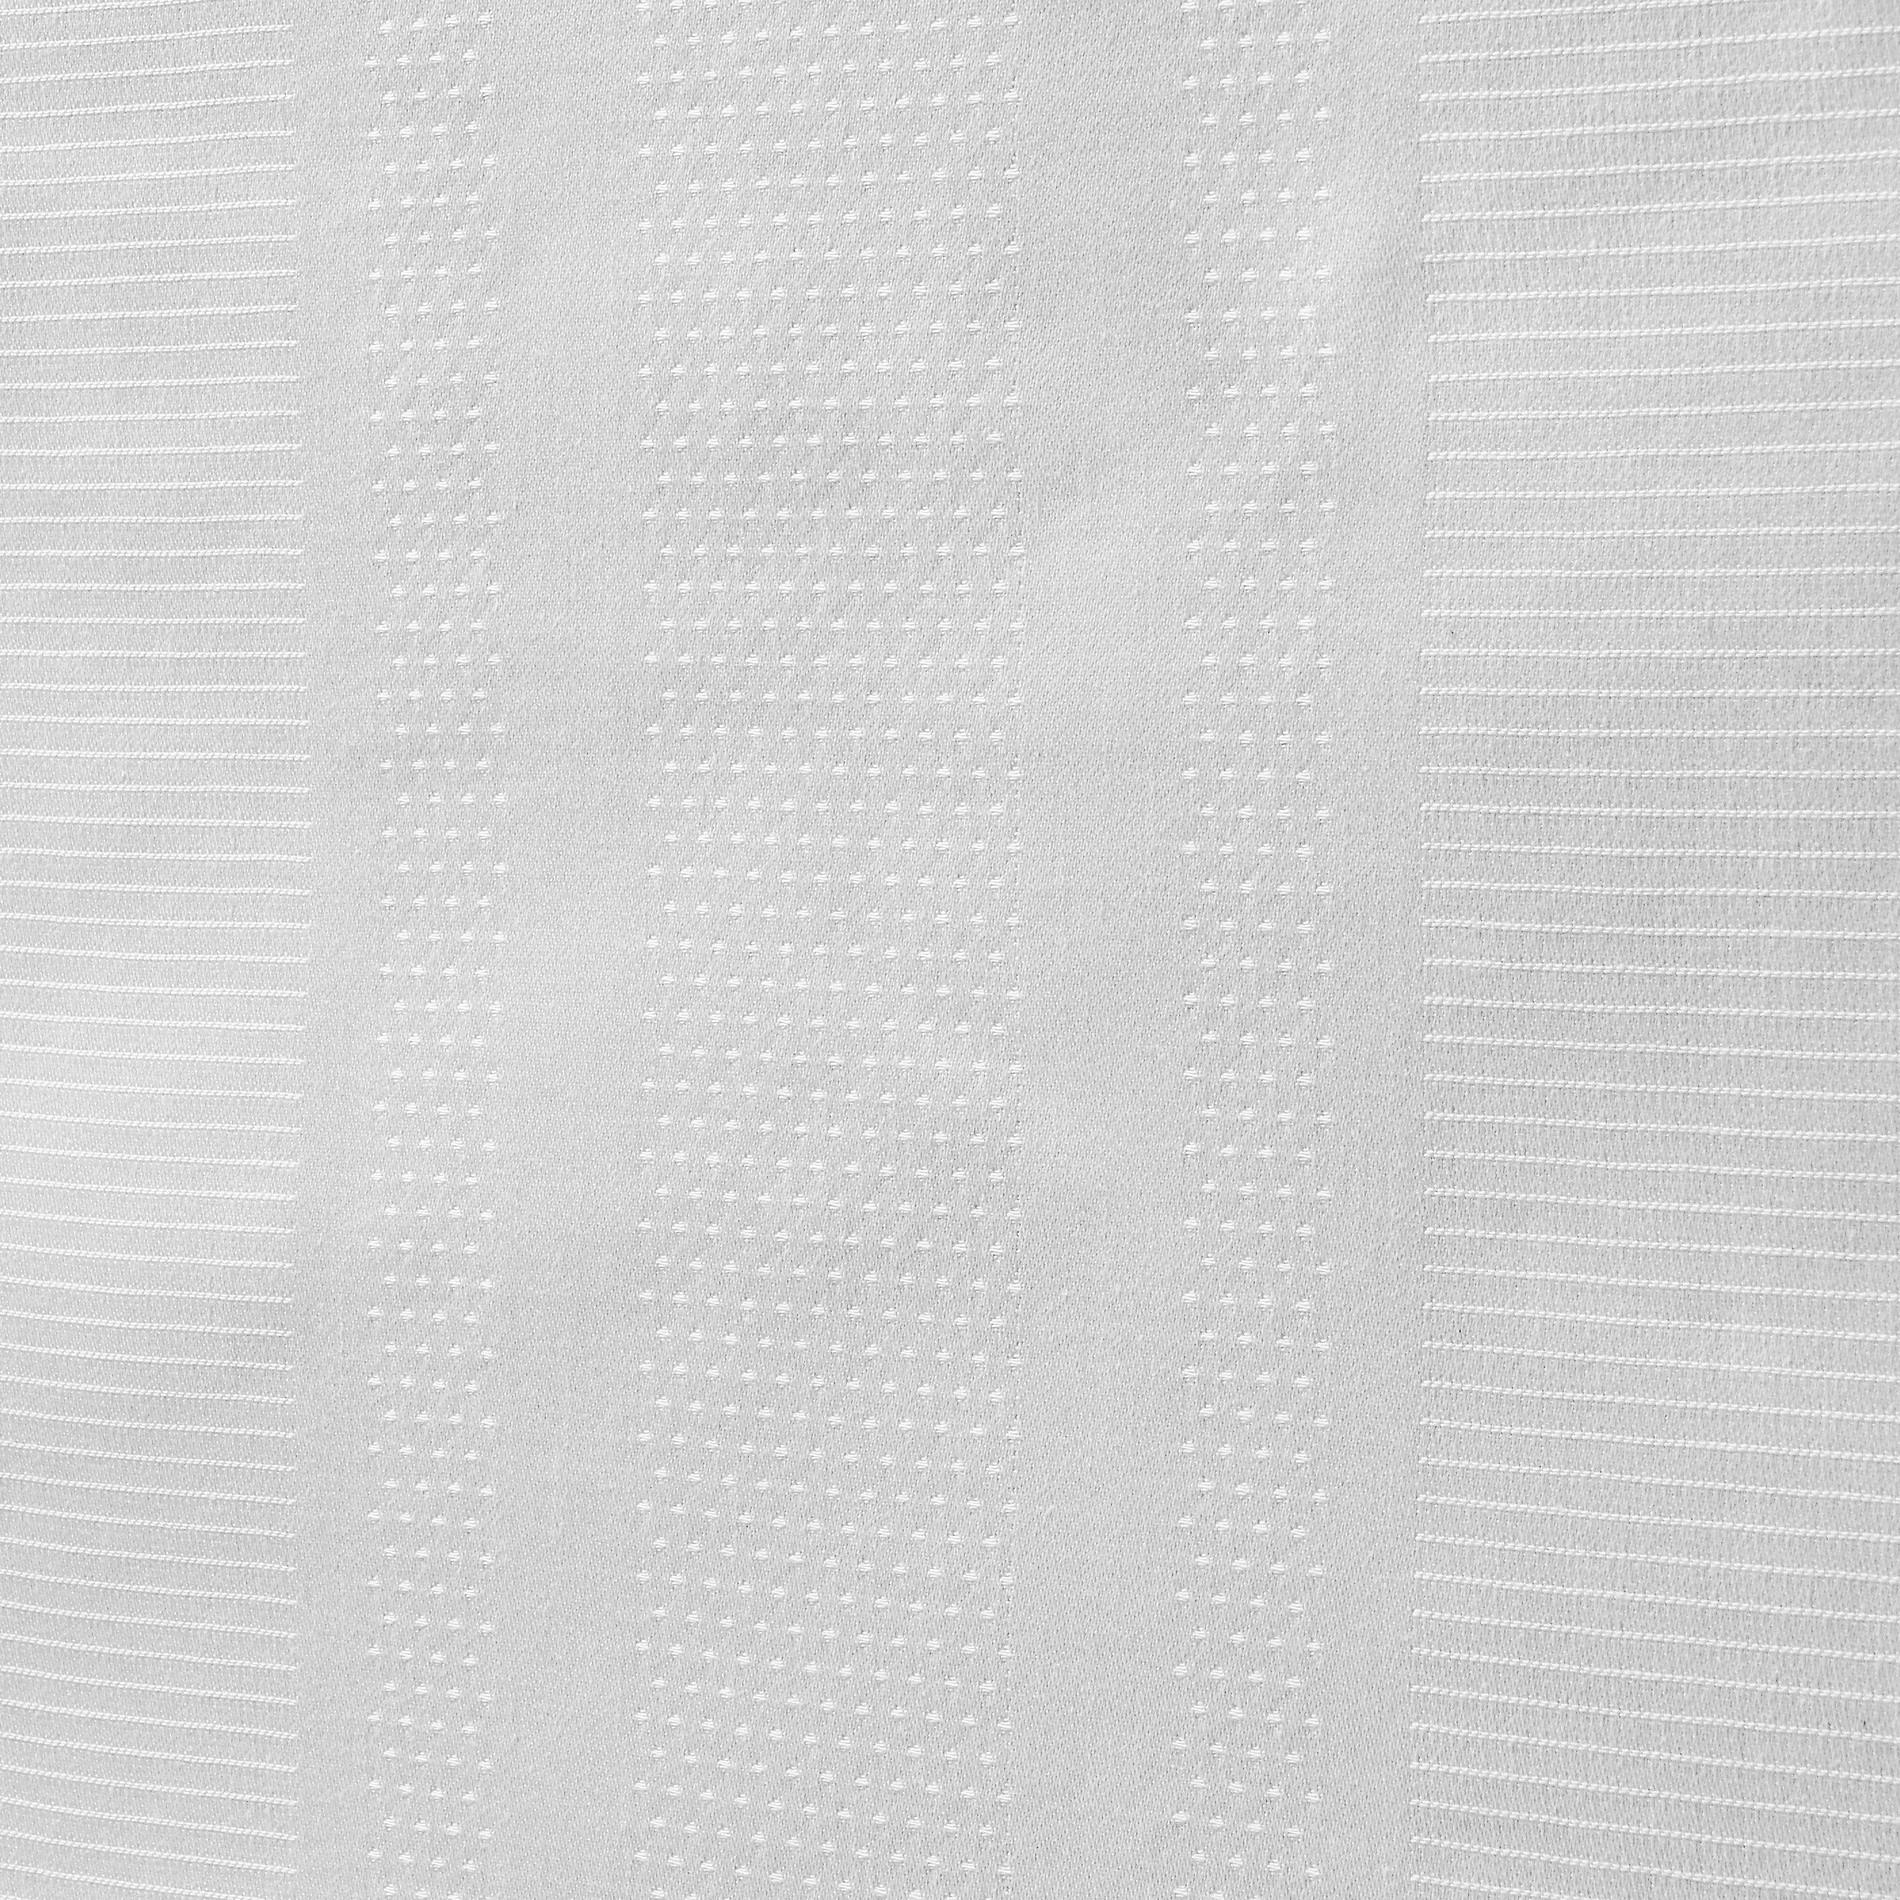 Tovaglia puro cotone egiziano jacquard, Bianco ghiaccio, large image number 1